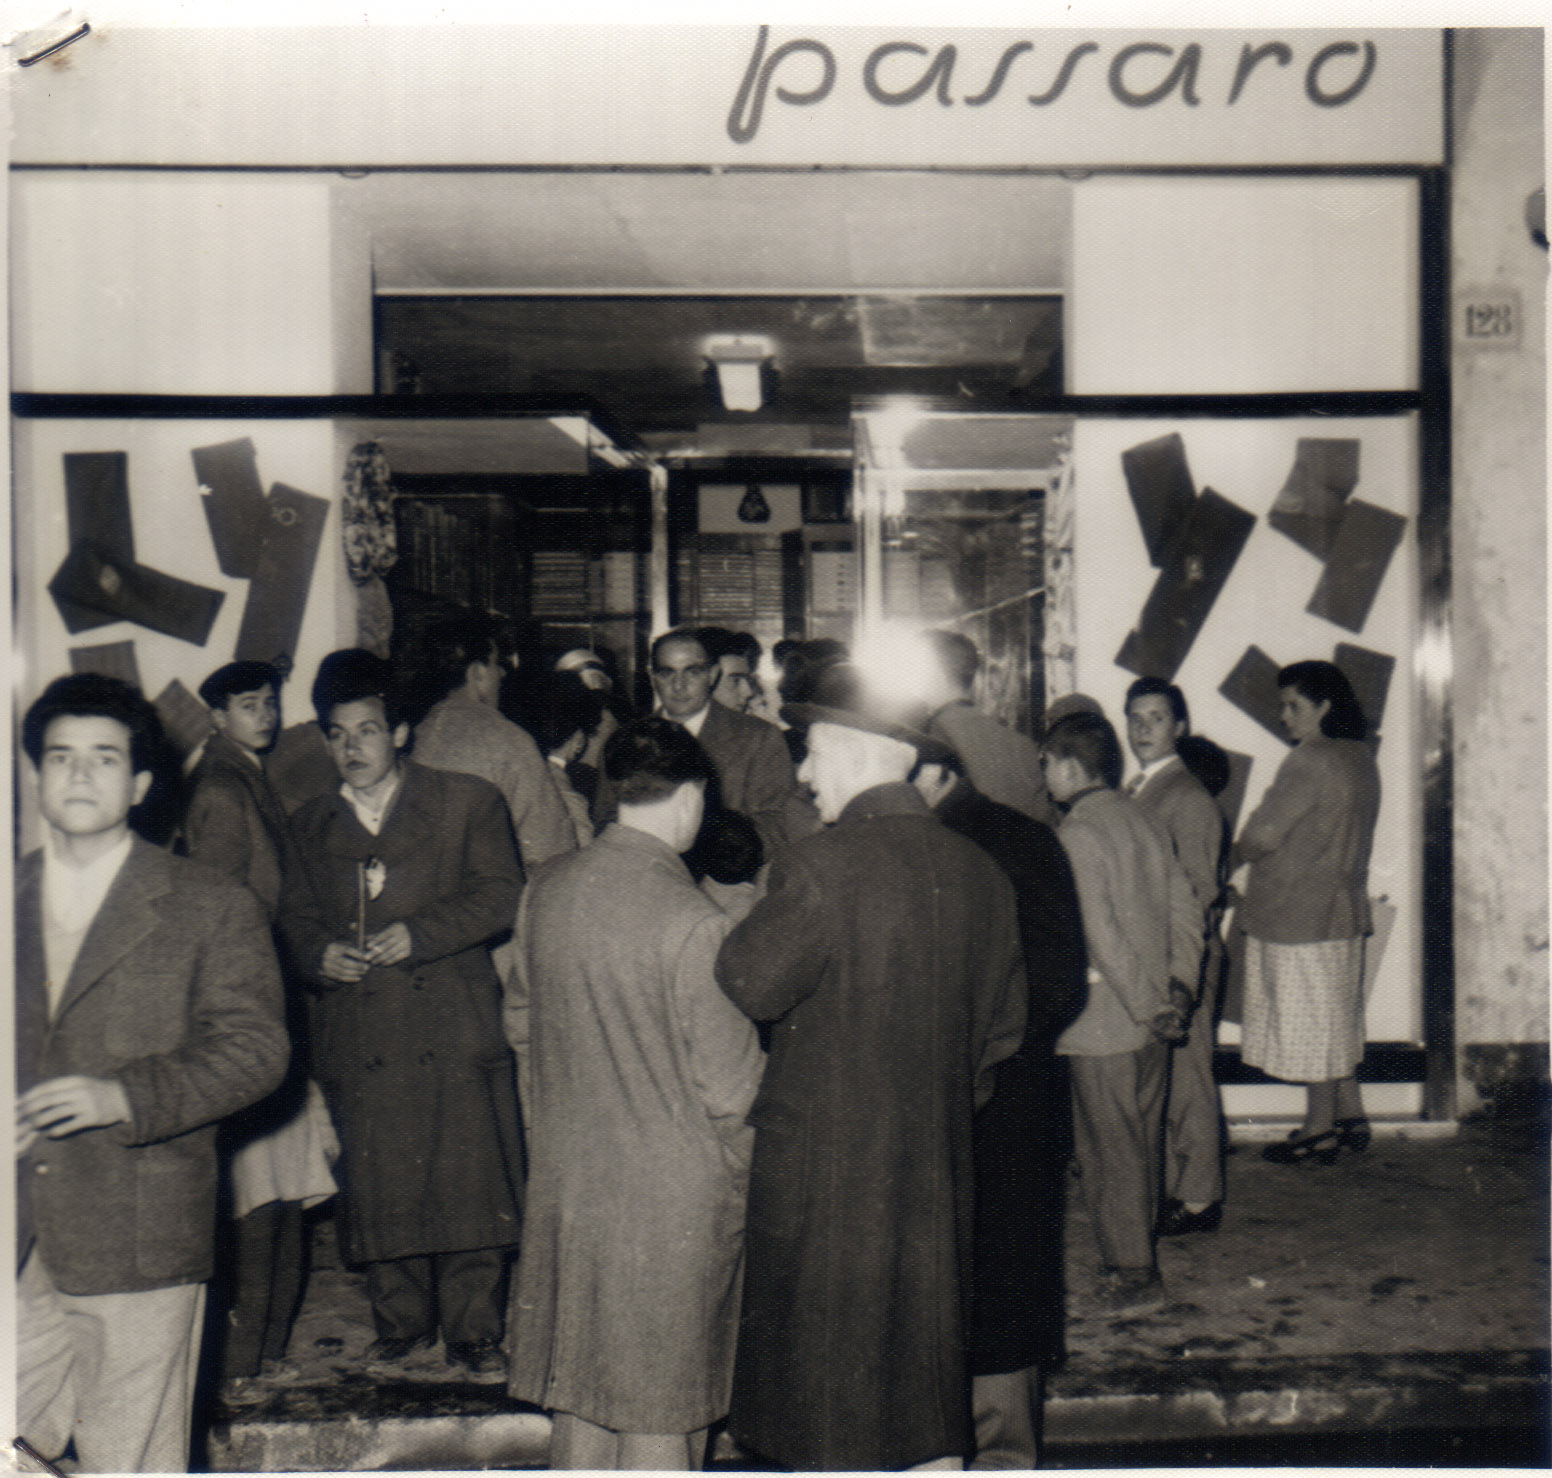 Passaro 1946 - PassaroSposa.it